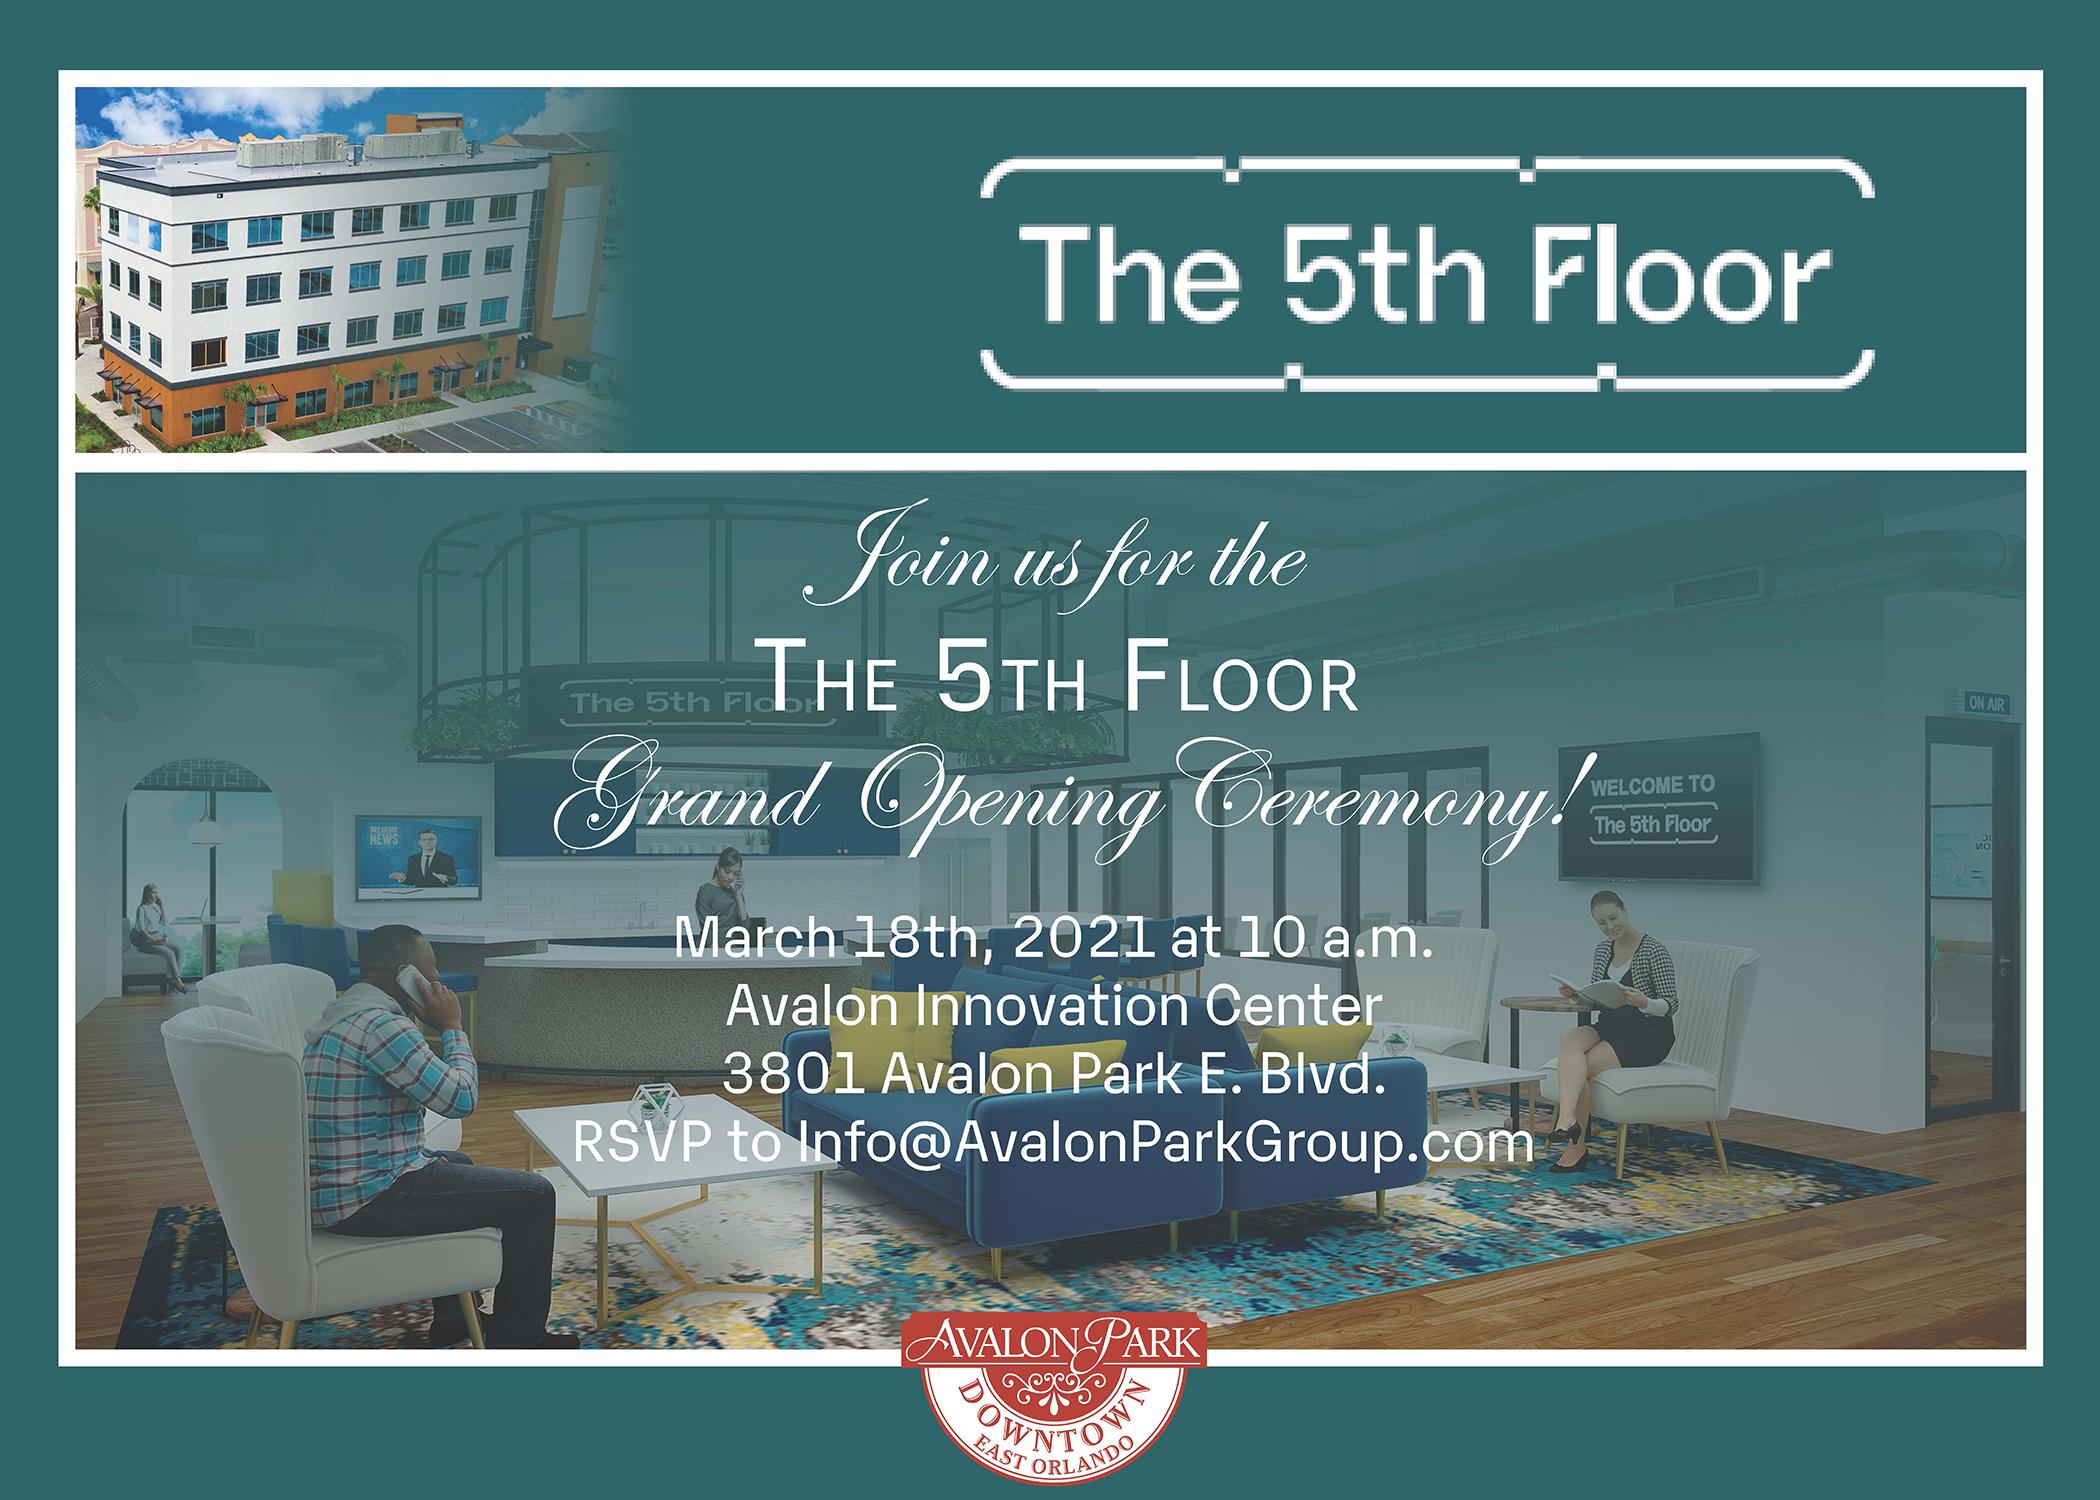 The 5th Floor Orlando Grand Opening